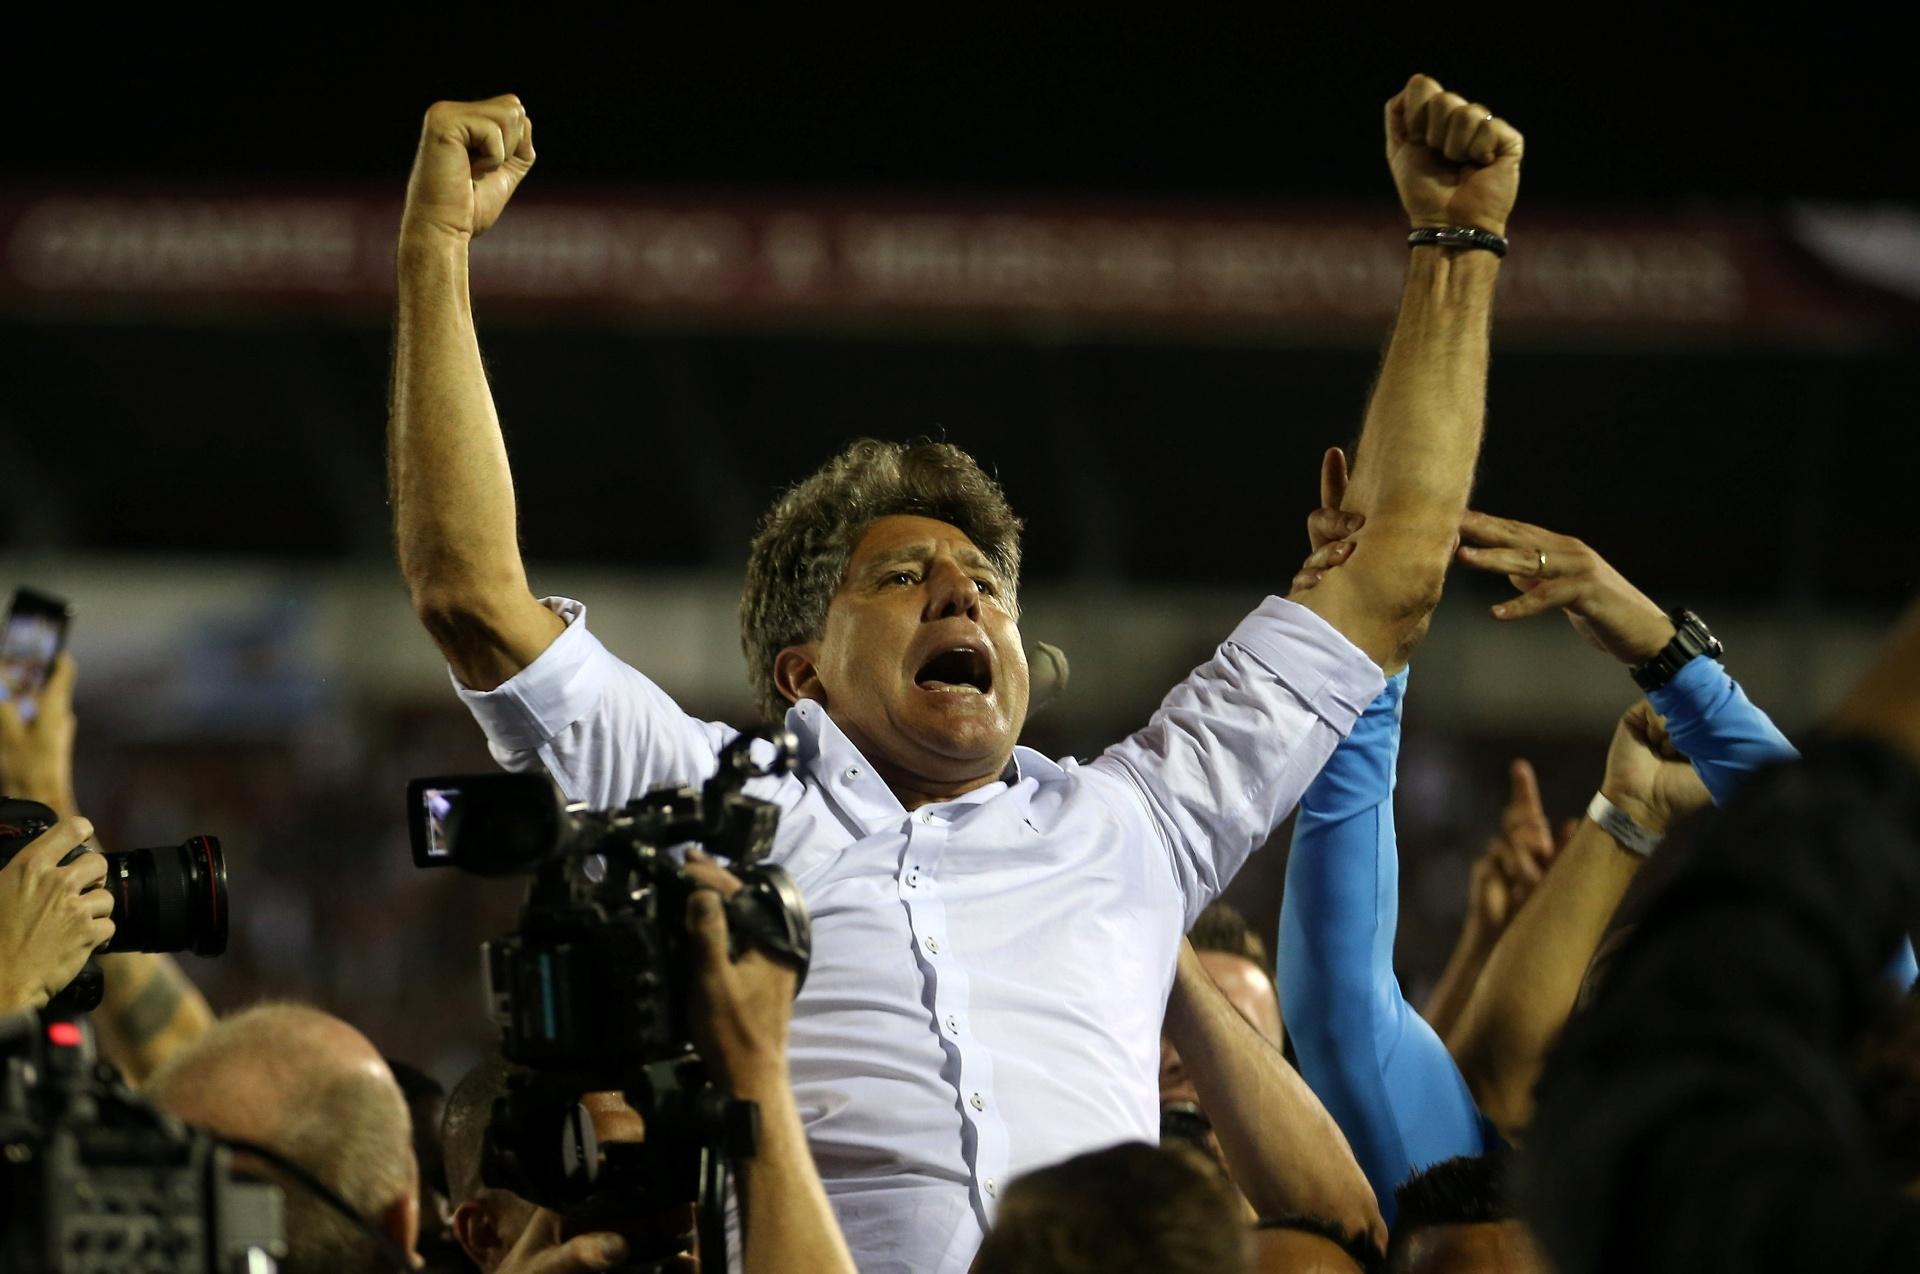 Renato completa 2 anos de Grêmio e passa de ídolo a